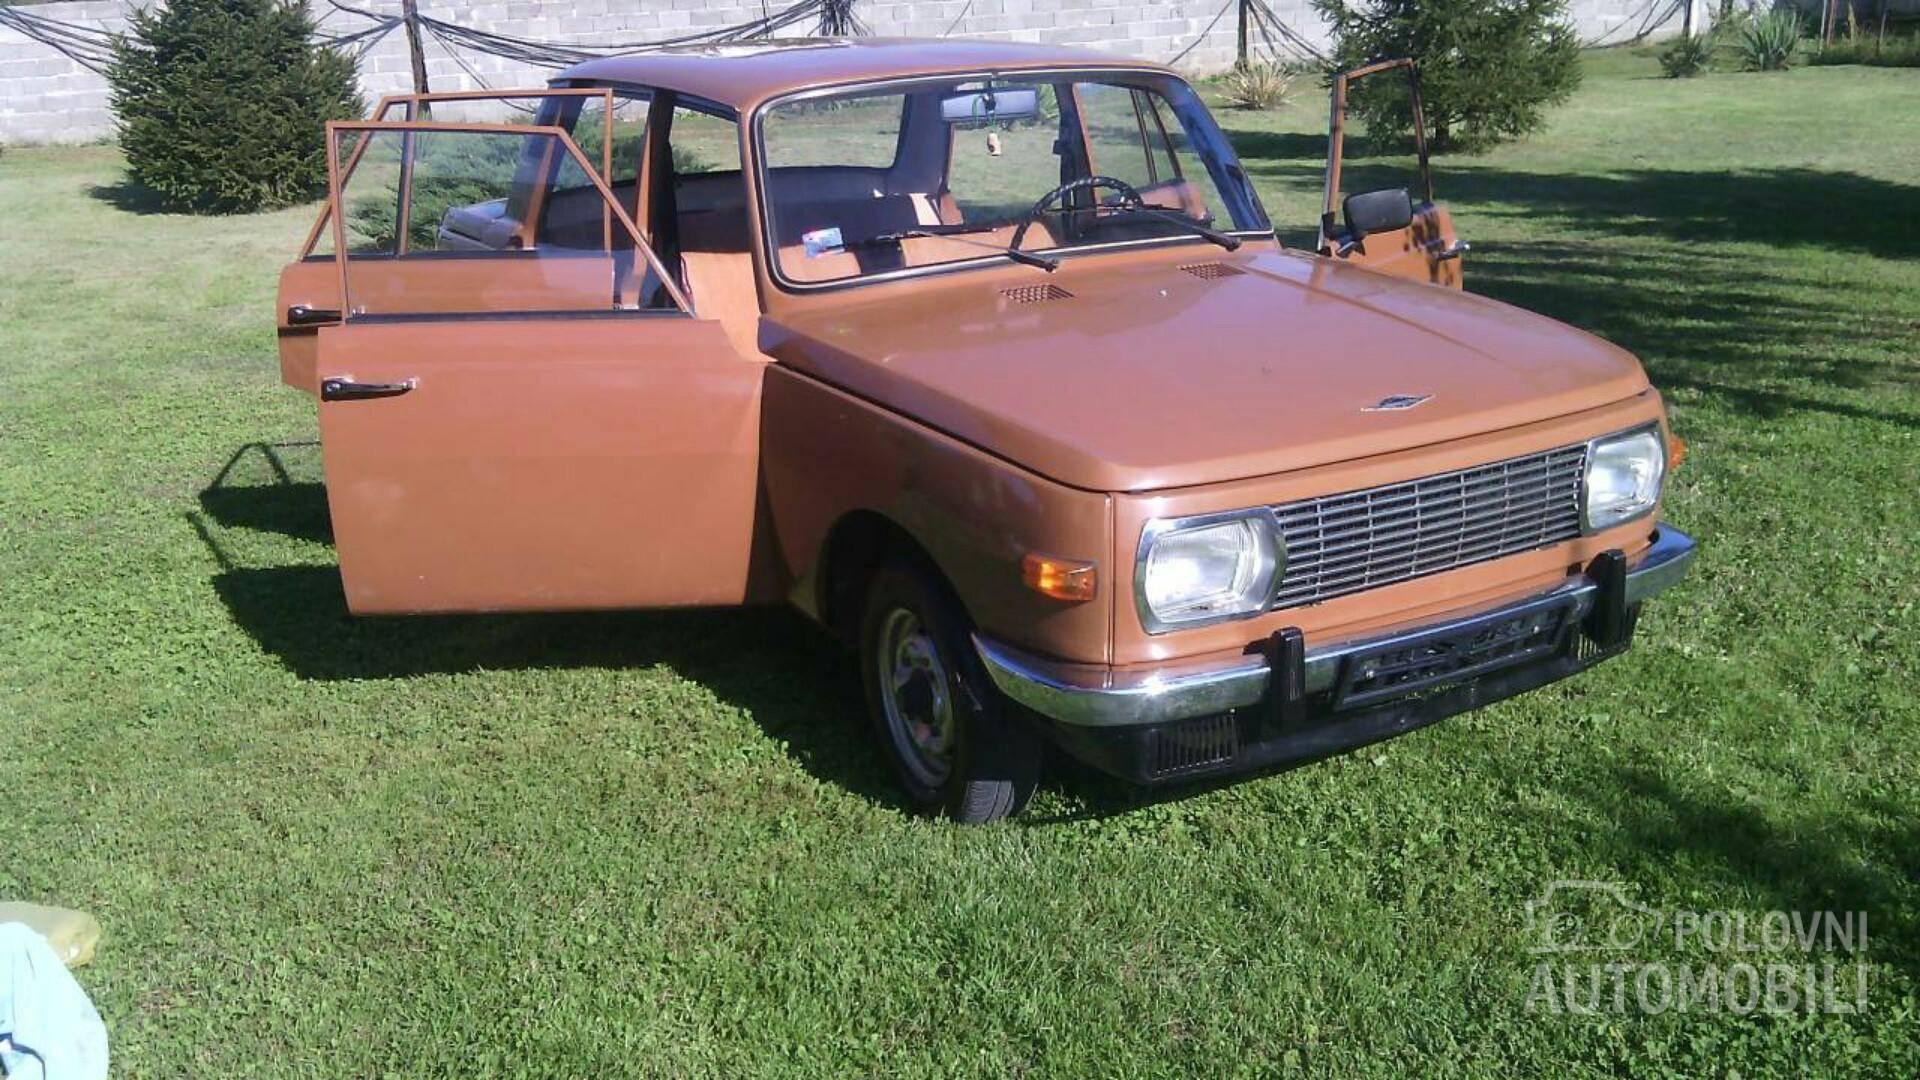 1980 Wartburg 353 1500 Autoslavia